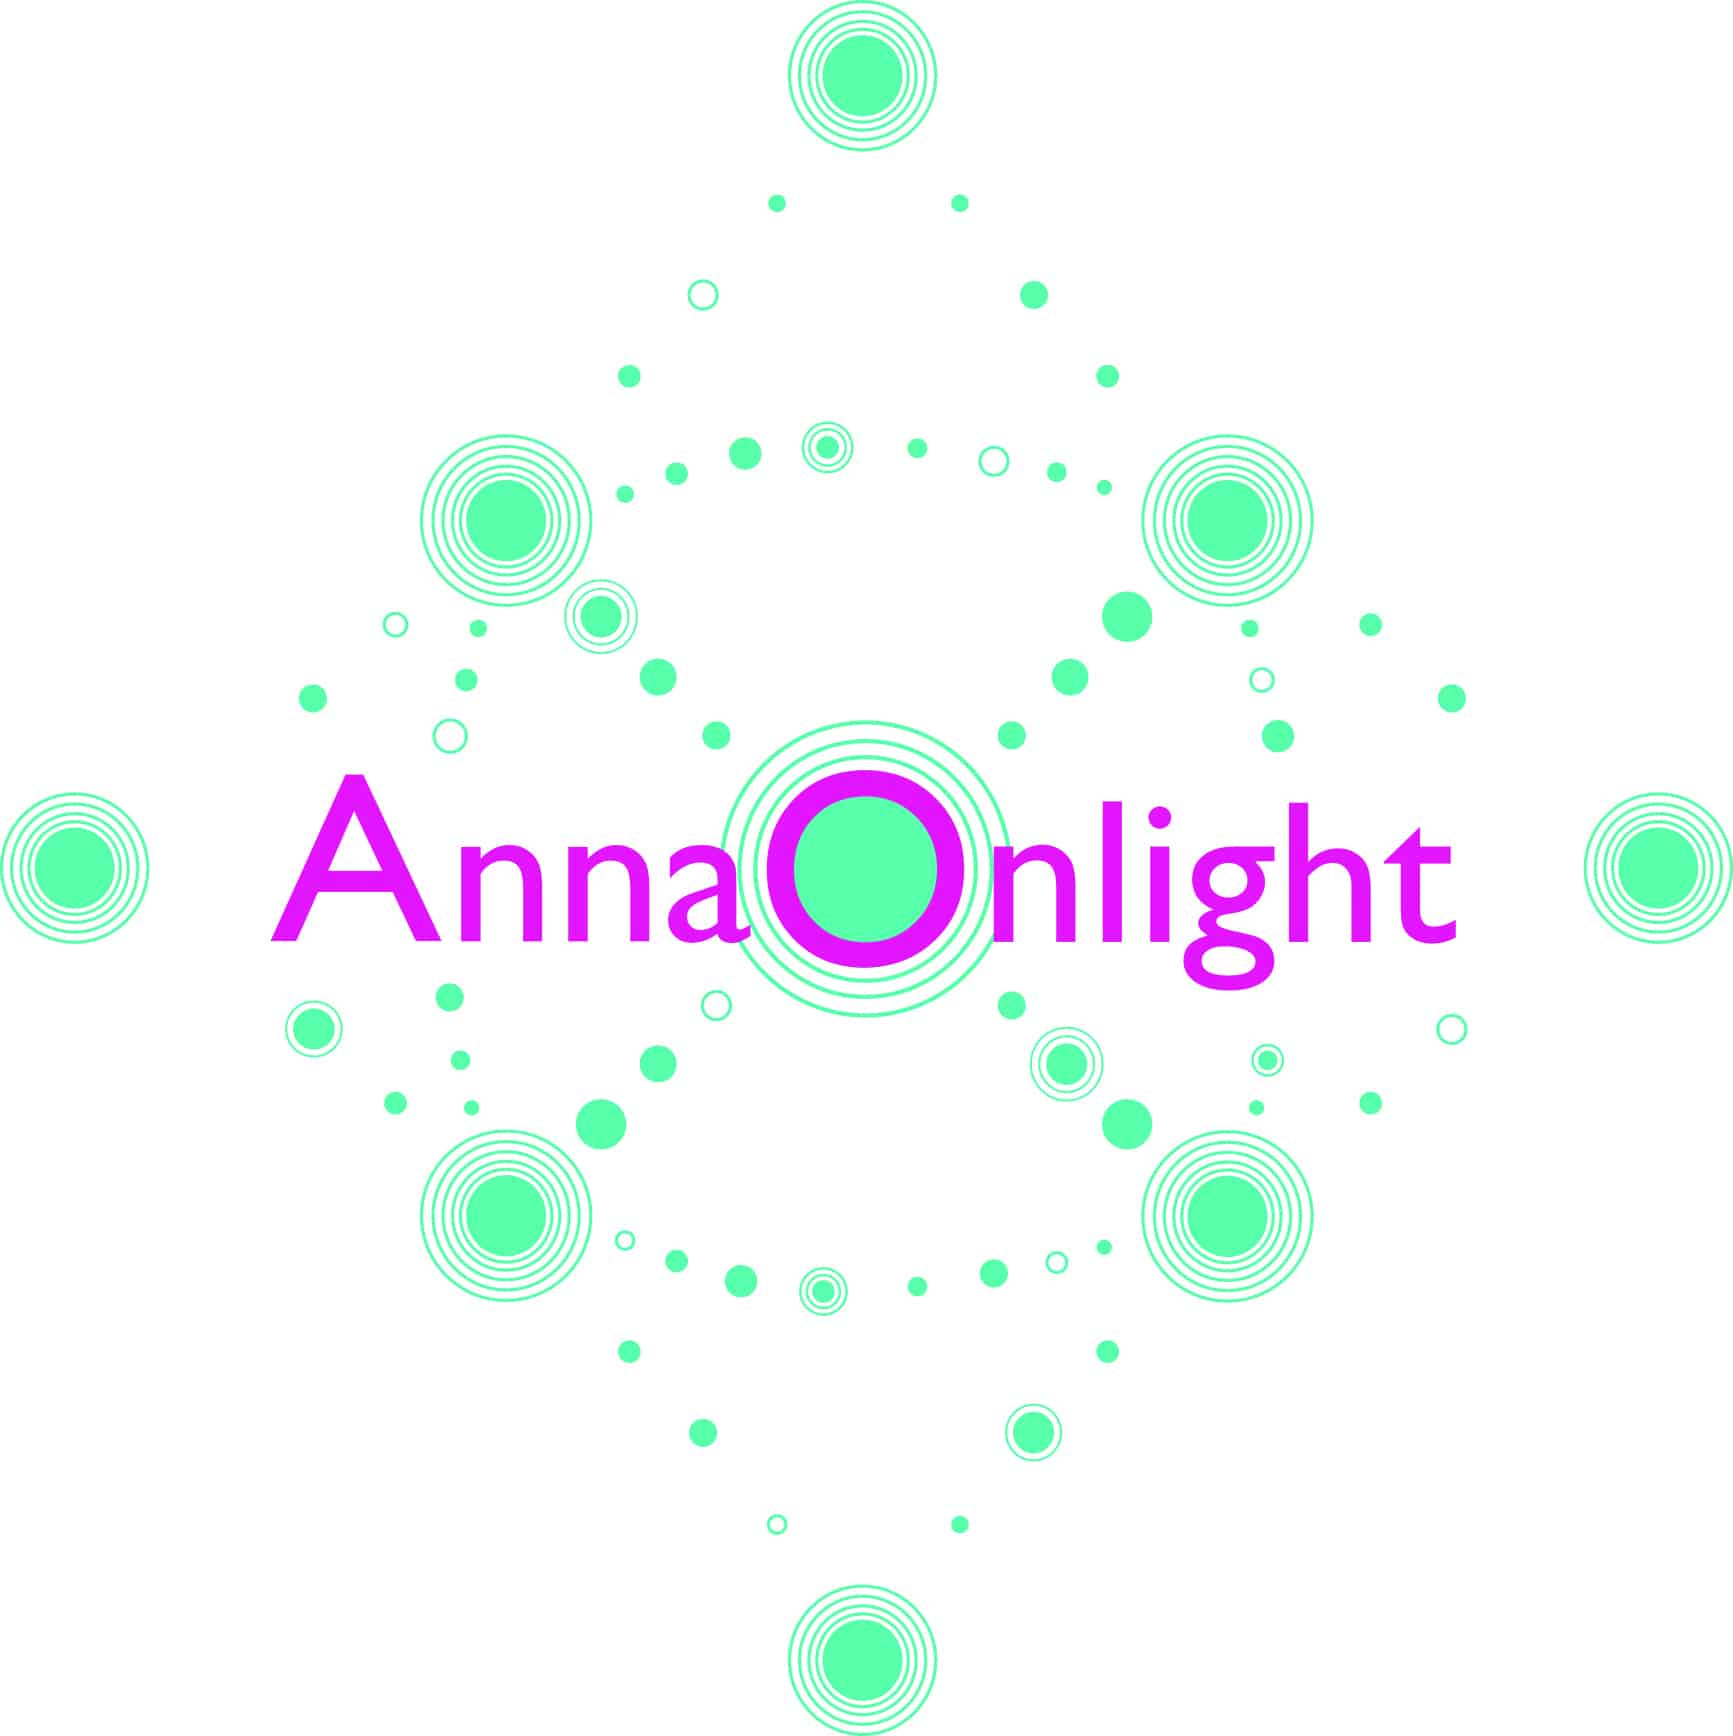 AnnaOnlight